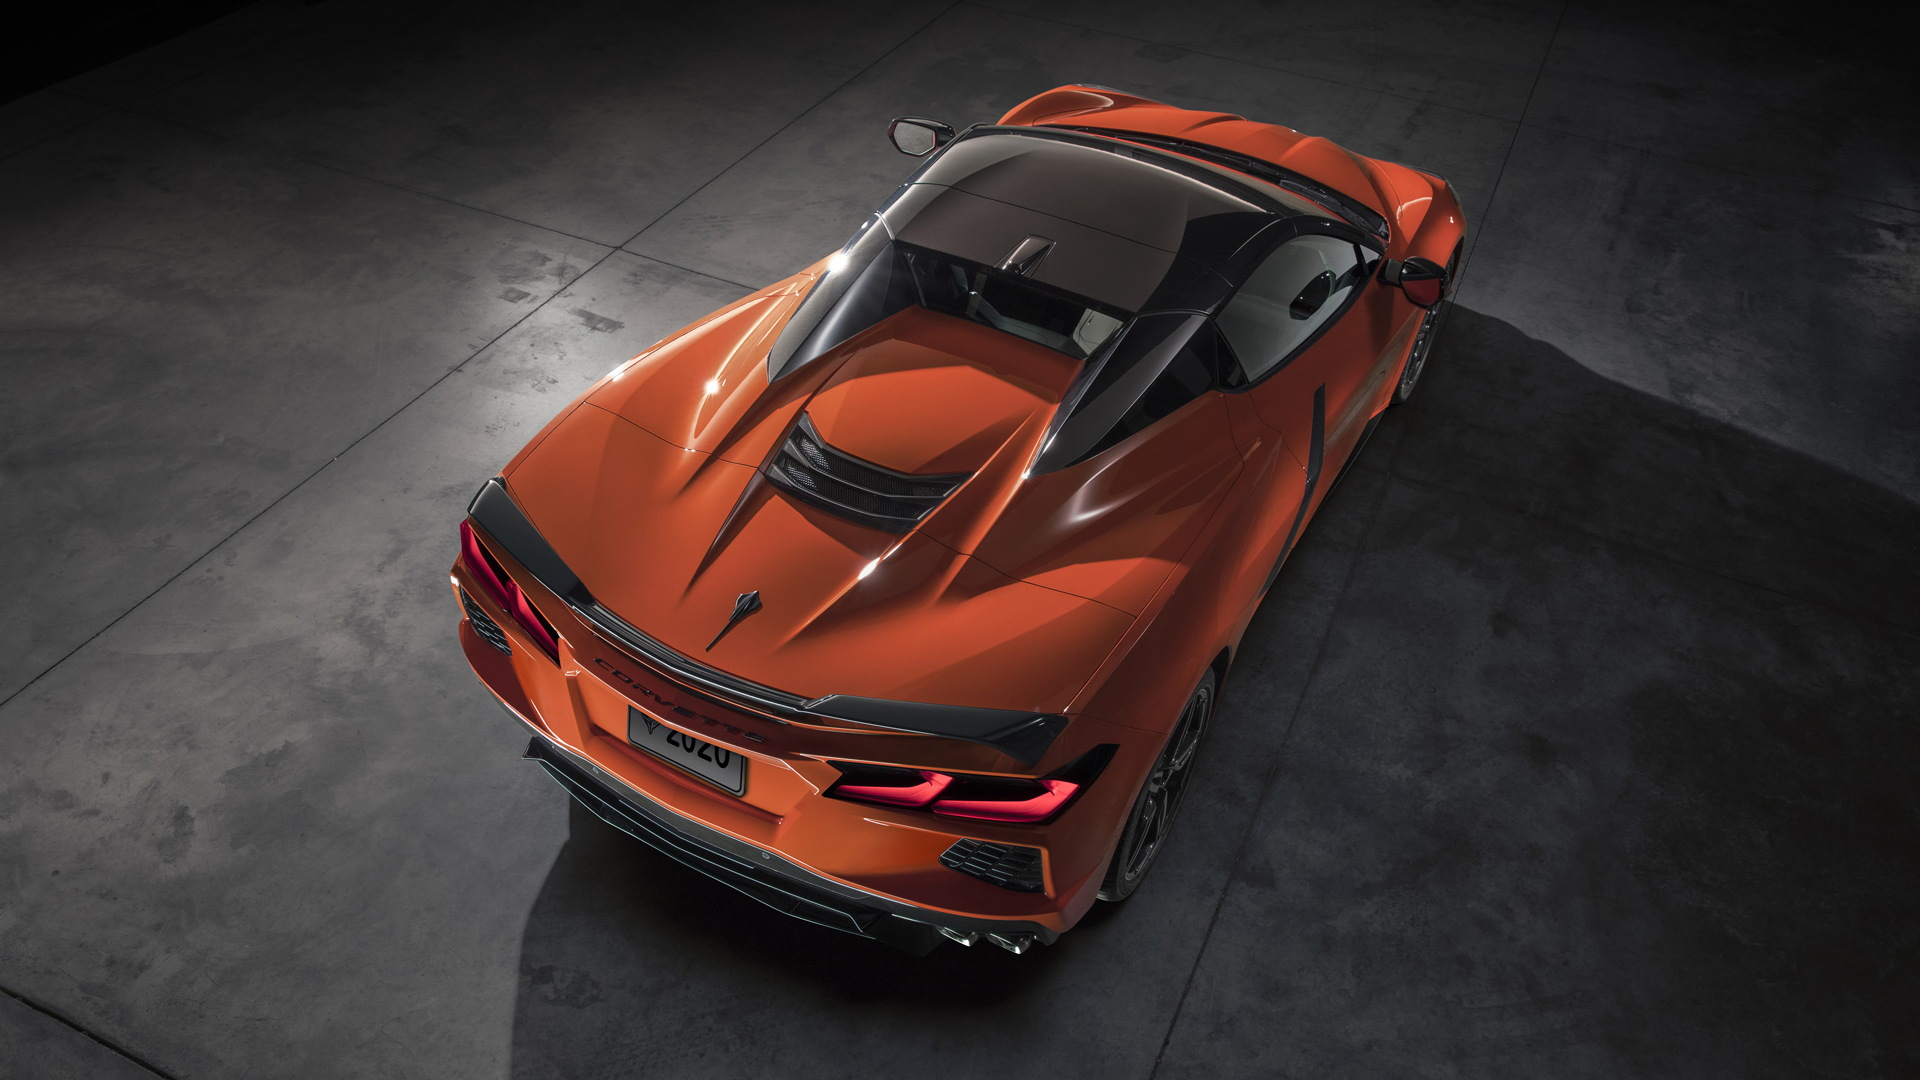 New Chevrolet Corvette Convertible gets folding hardtop